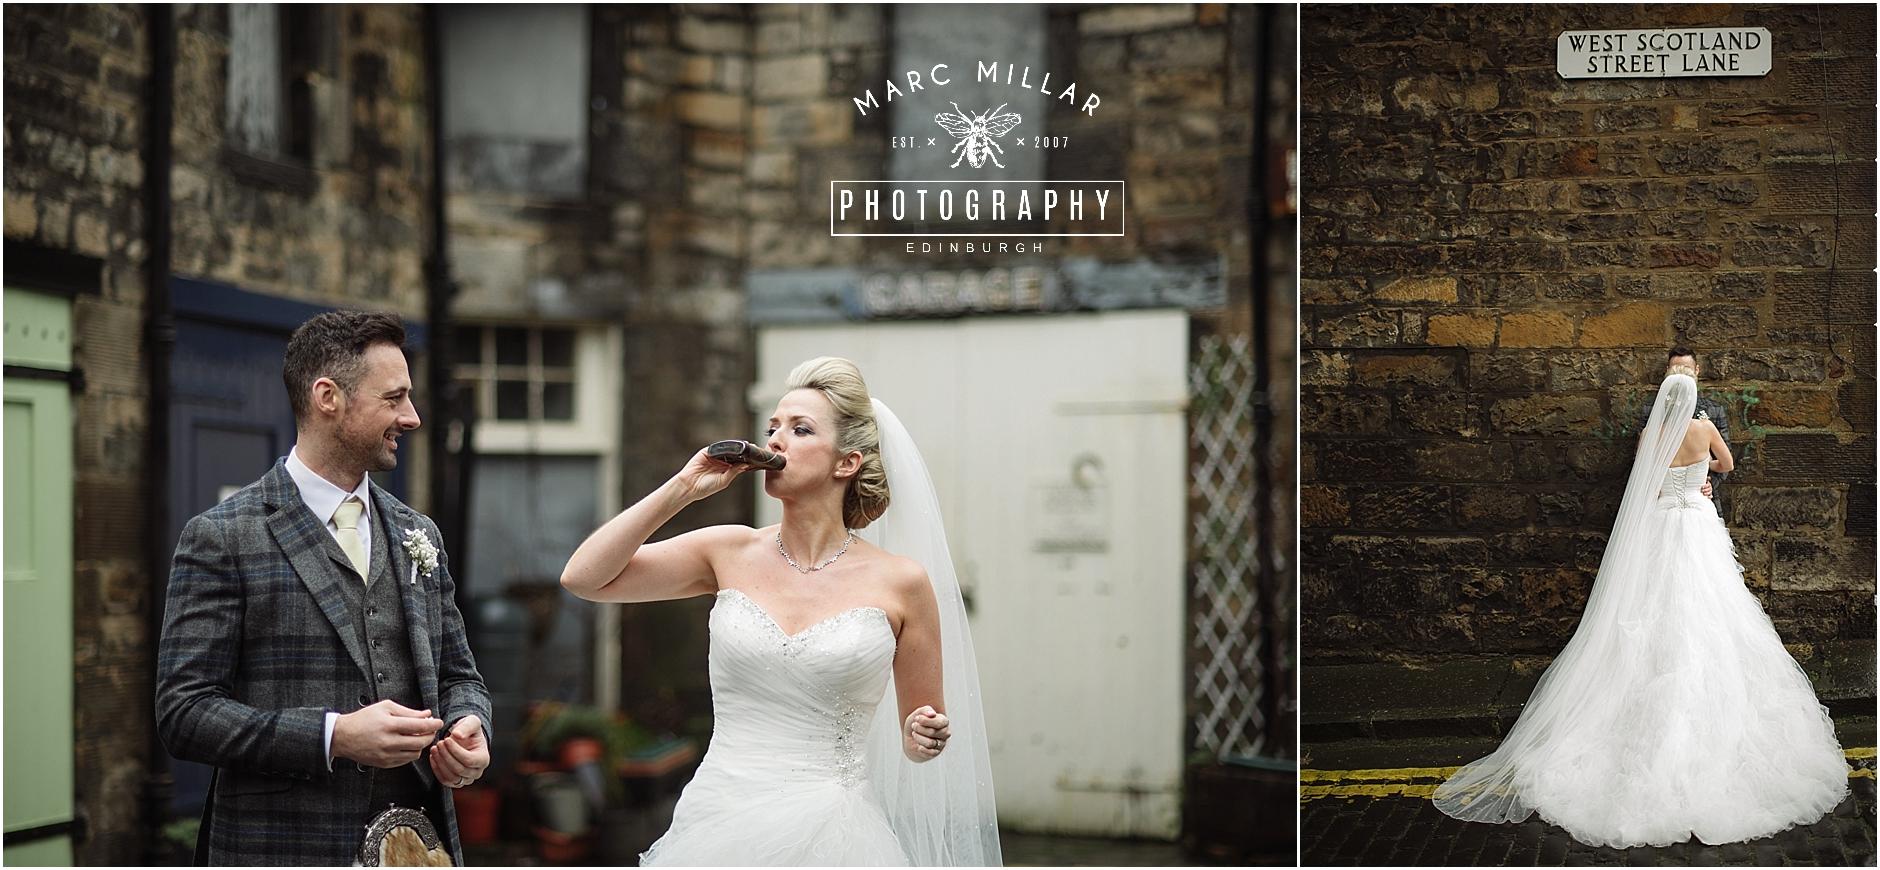 130216 Mansfield Traquair Wedding362.jpg